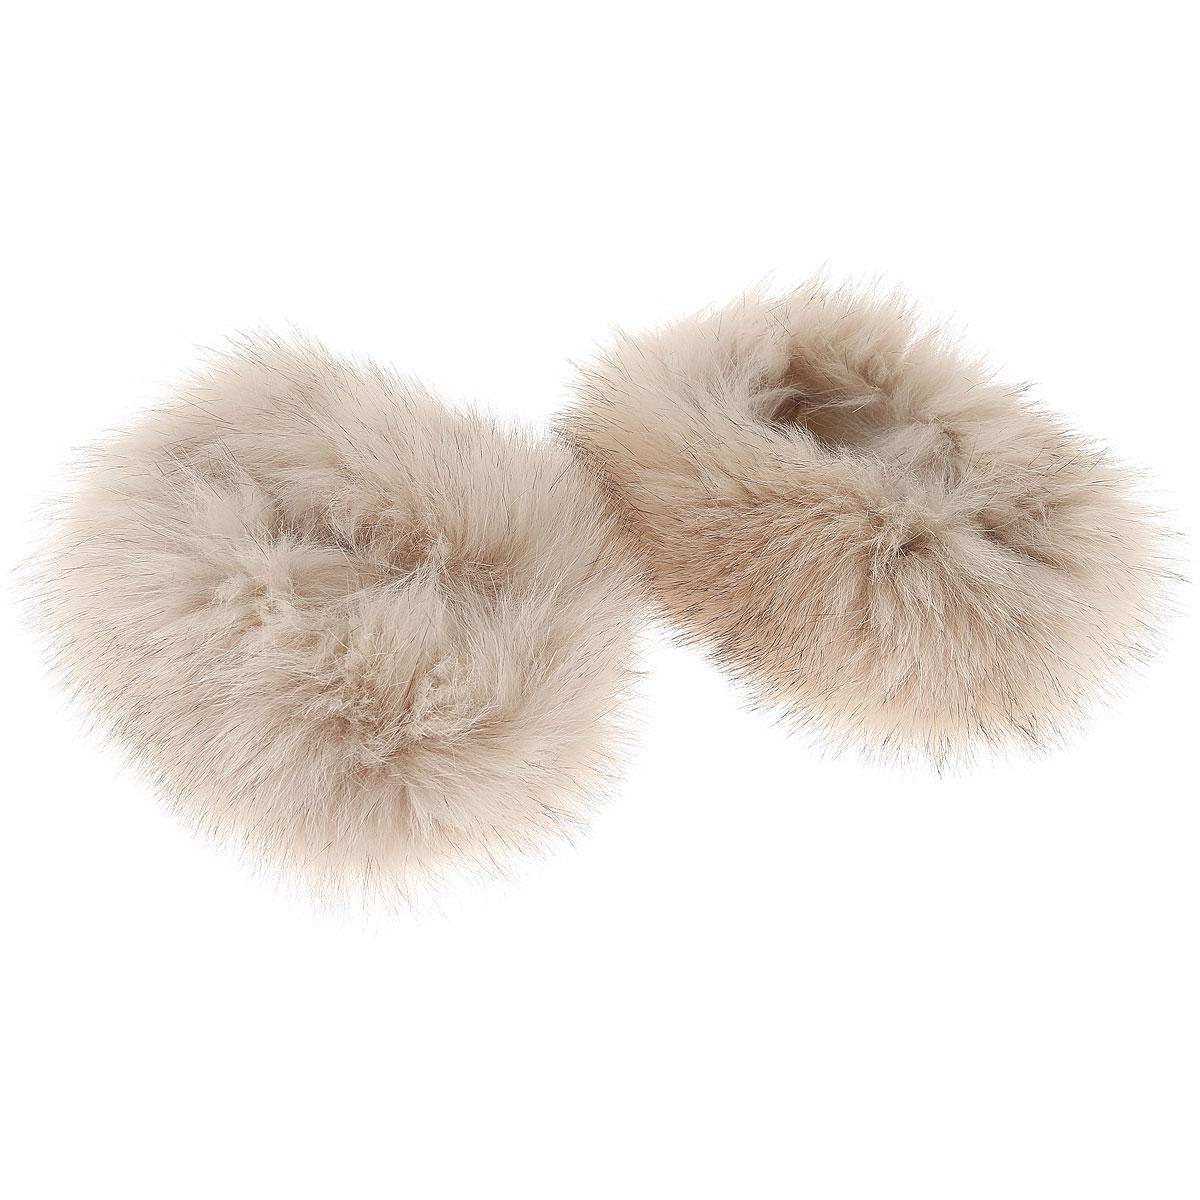 Image of D. Exterior Gloves for Women On Sale in Outlet, Beige, Fur, 2017, I II III